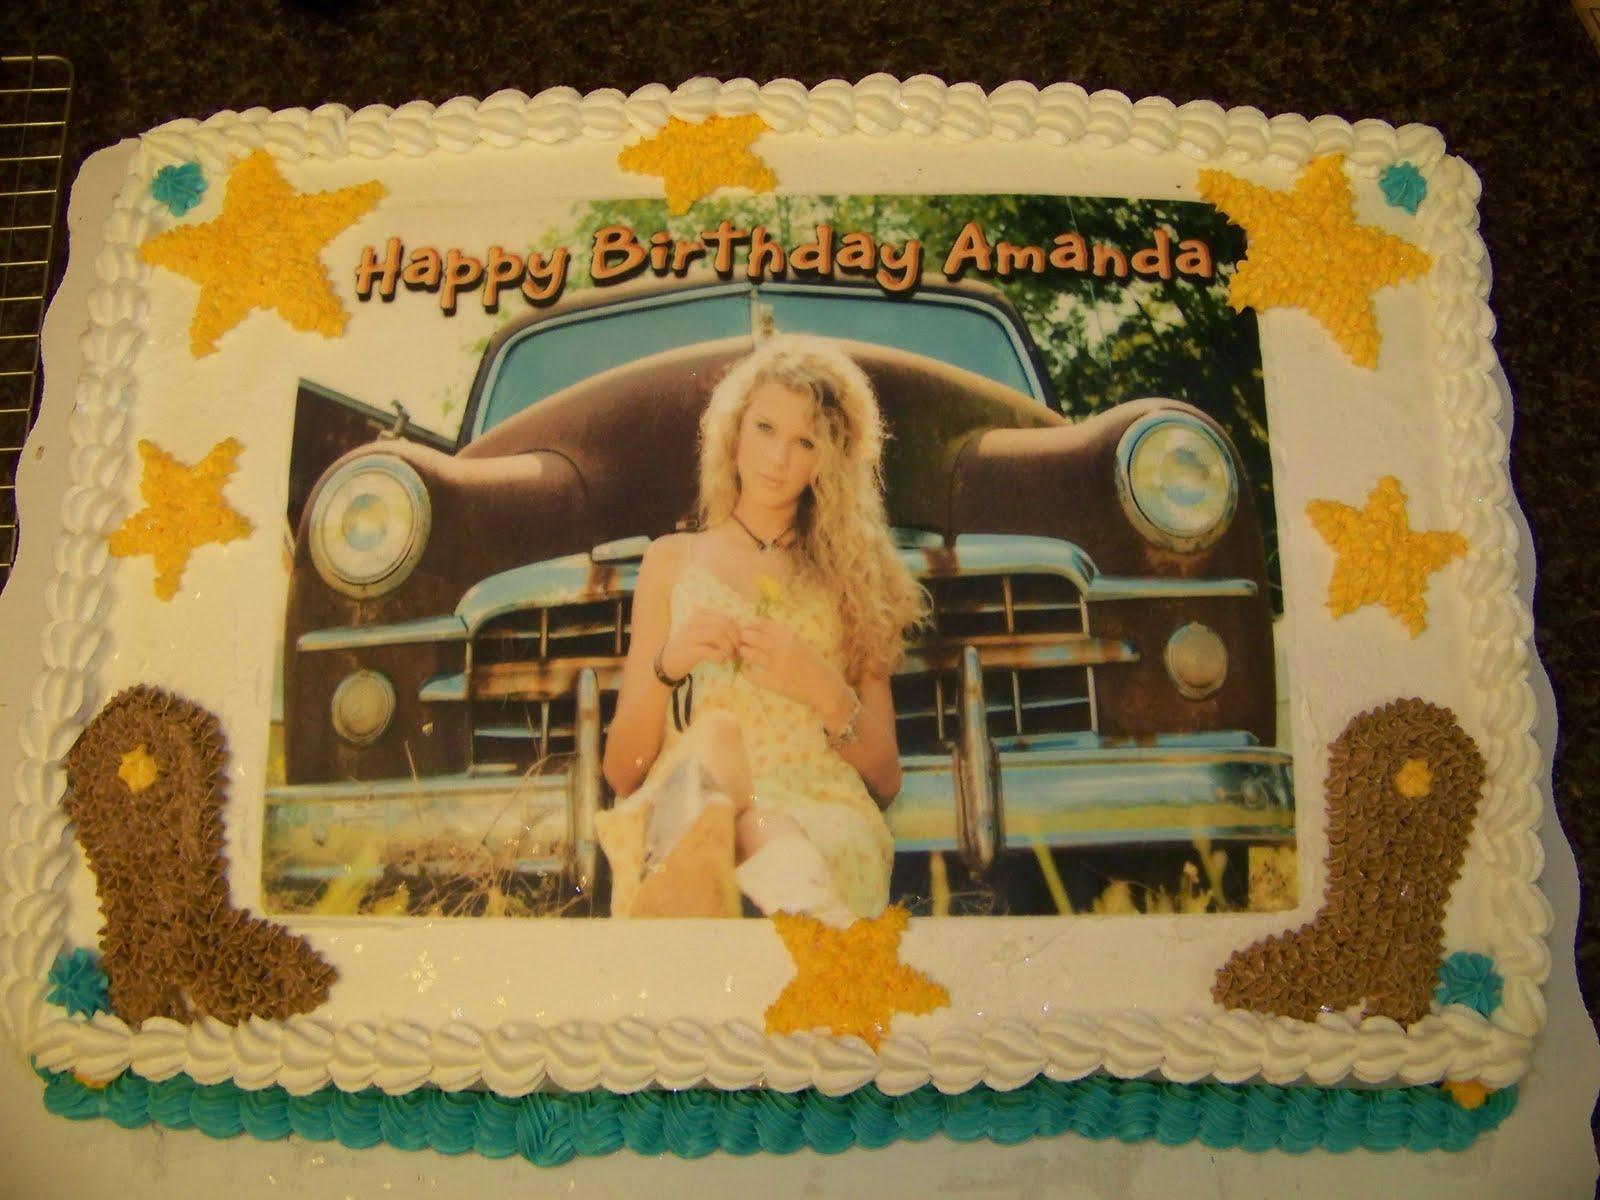 Cake Designs By Patty : PattyCakes cakes by Patty J: taylor swift cake